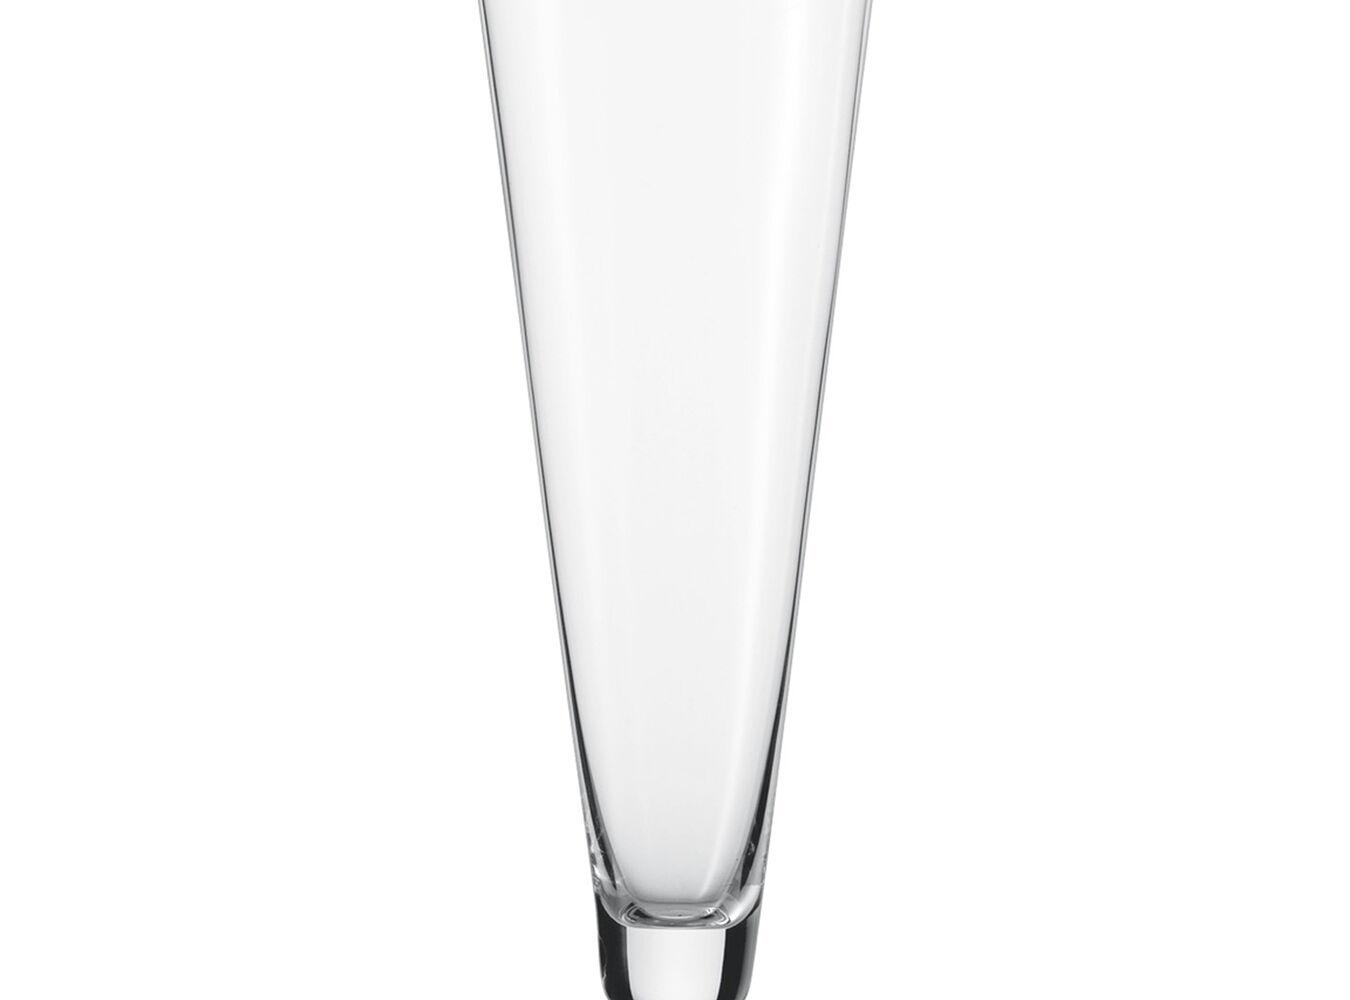 Schott Zwiesel Beer Basic Footed Pilsner Glasses, Set of 6 | Sur La Table